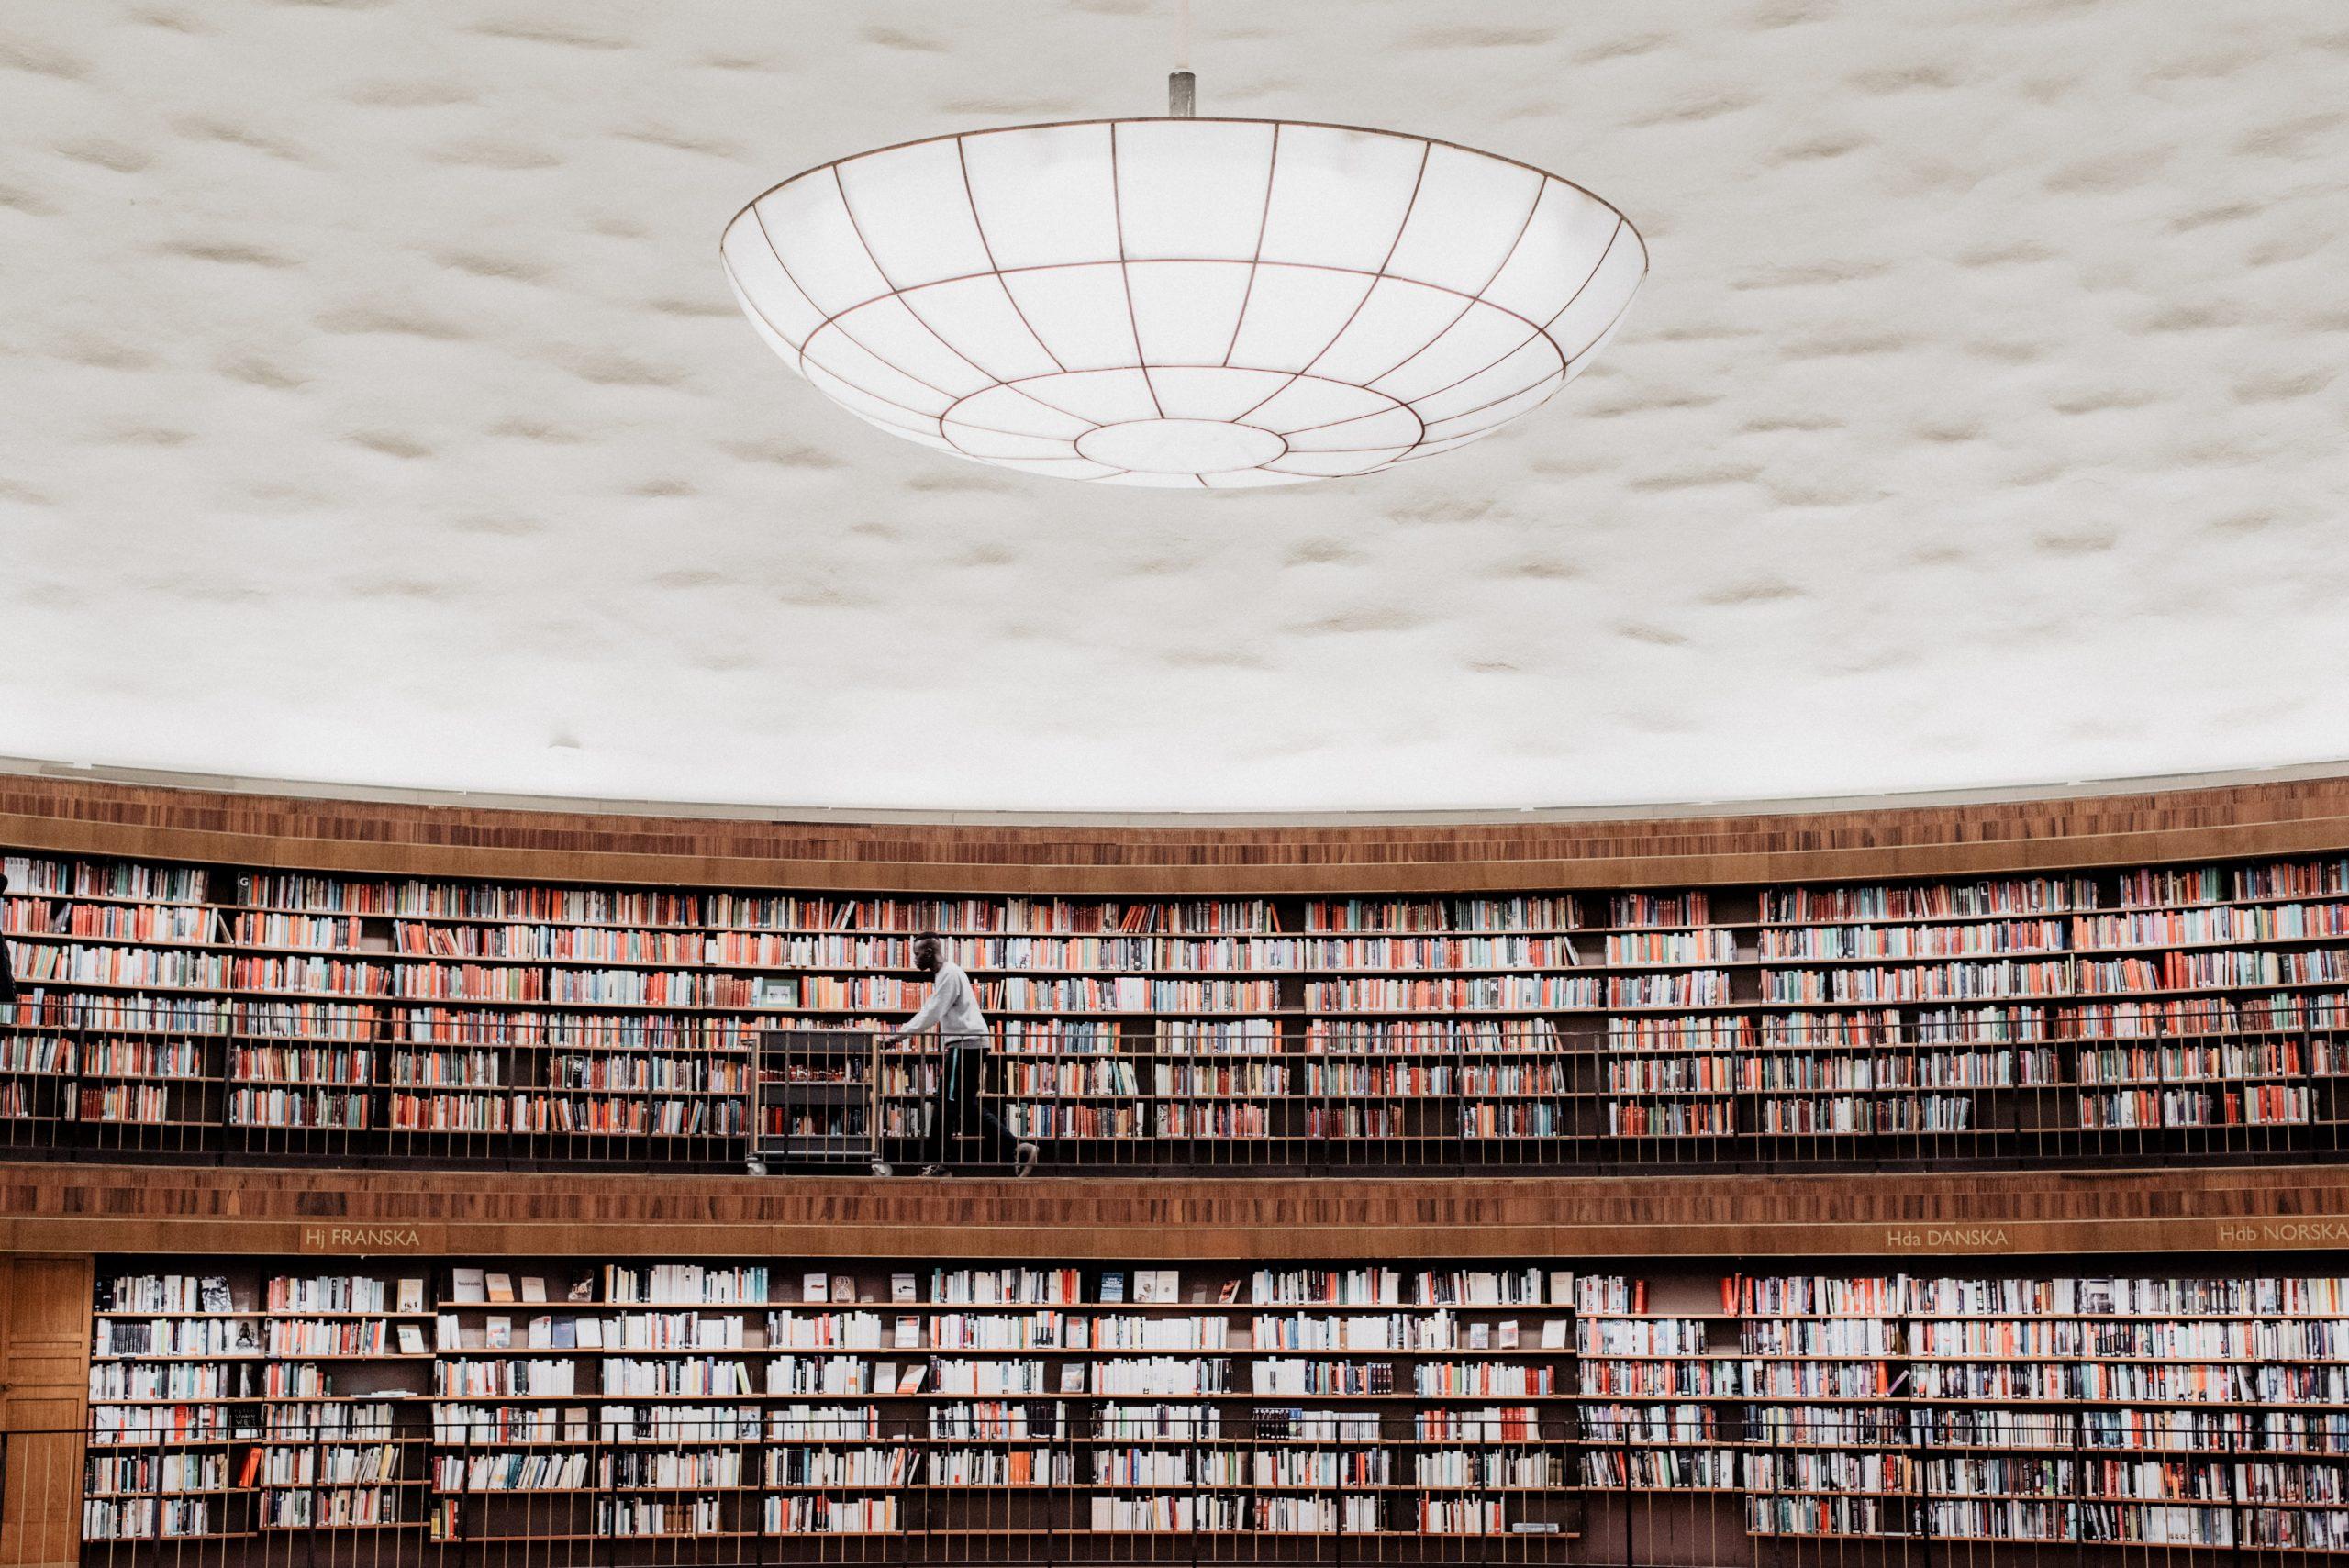 CSBNO Culture Socialità Biblioteche Network